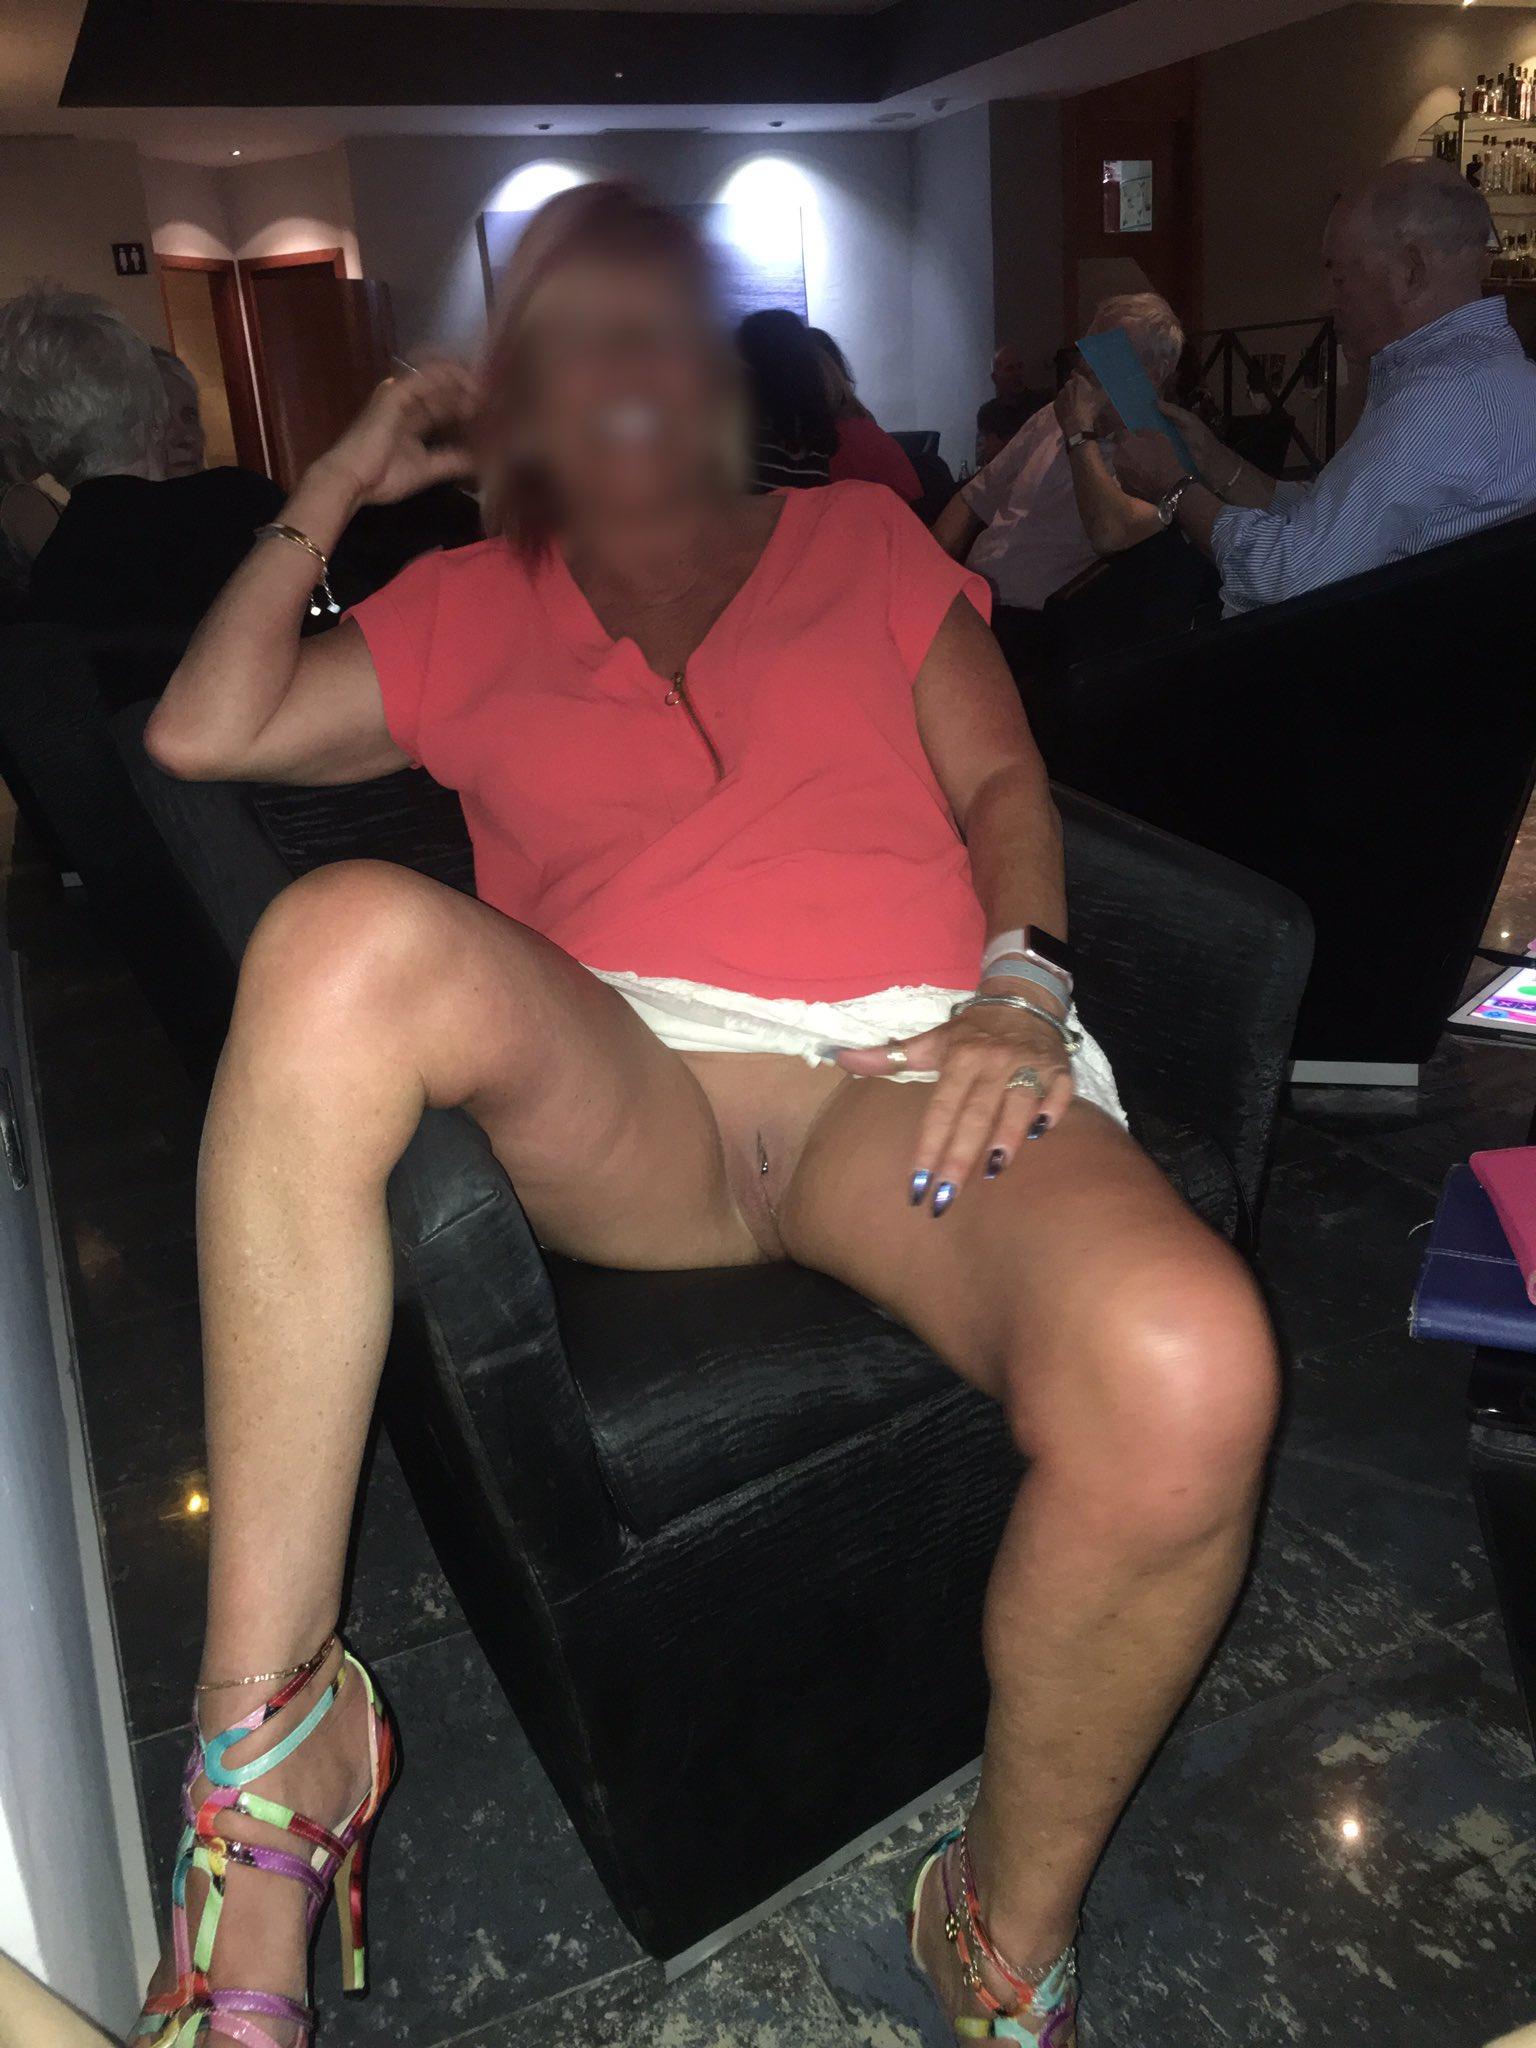 sexy milf sue on twitter hands up caught publicflashing